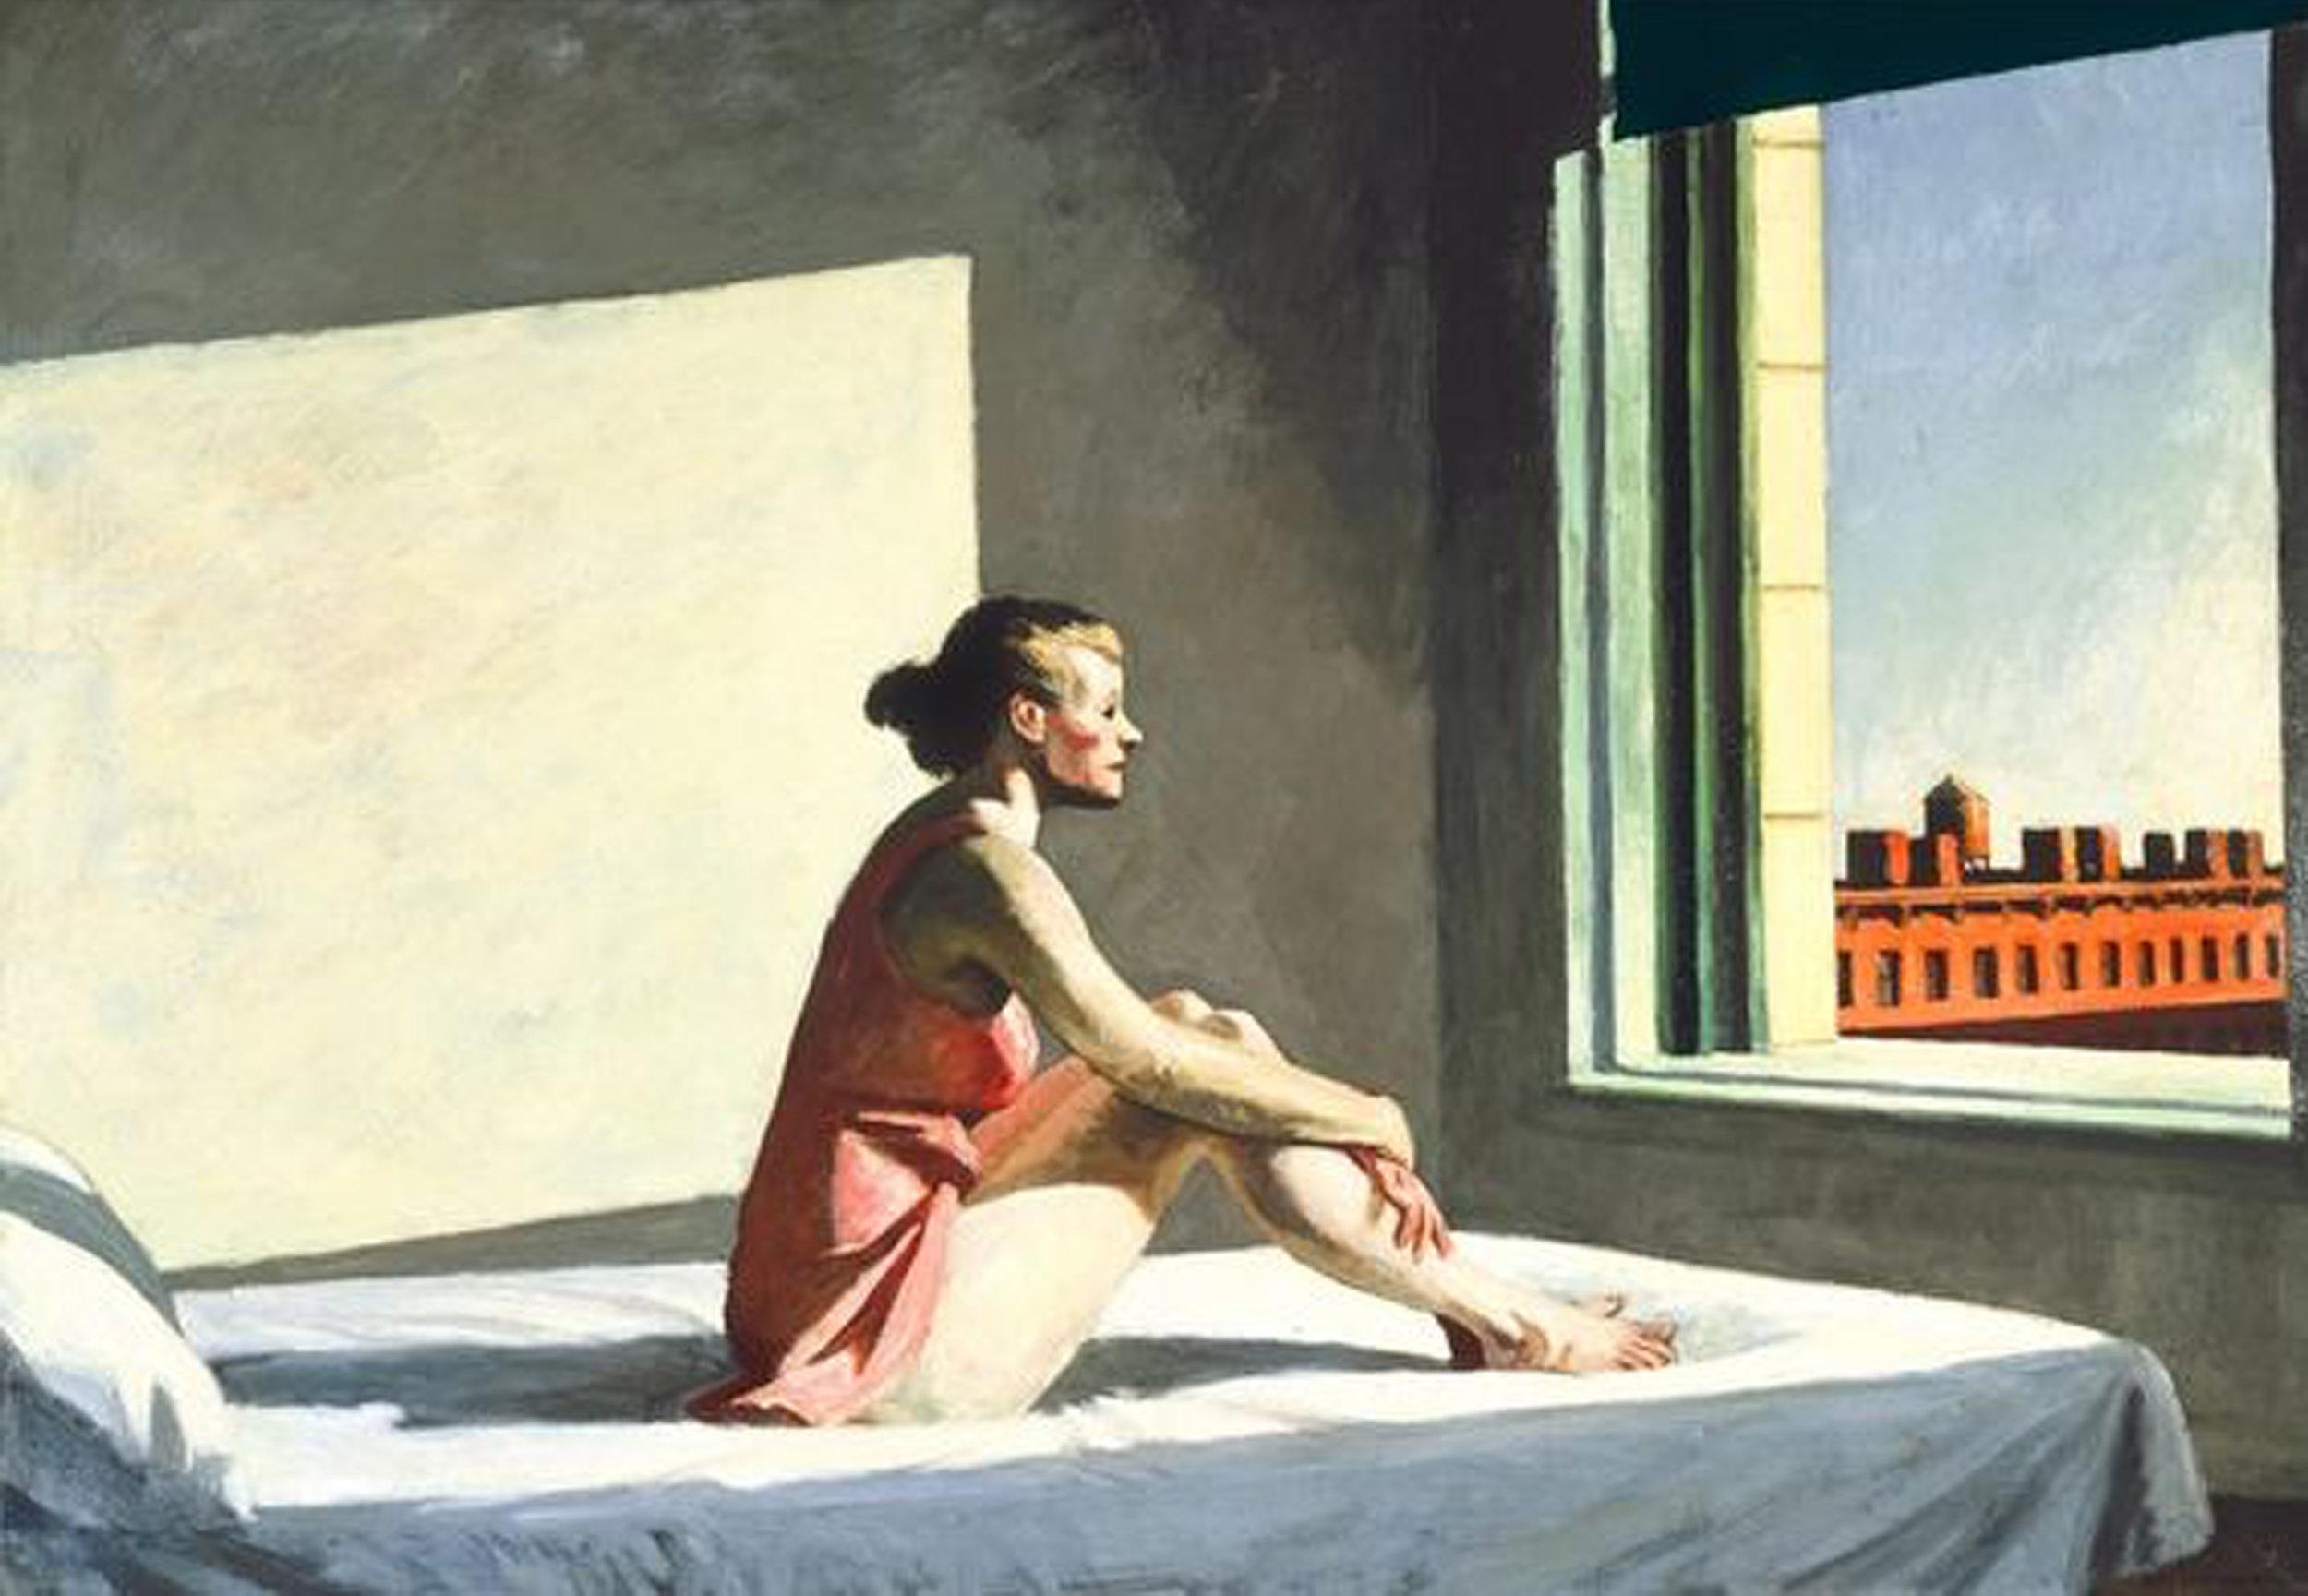 Morning Sun 1952 - painting Edward Hopper